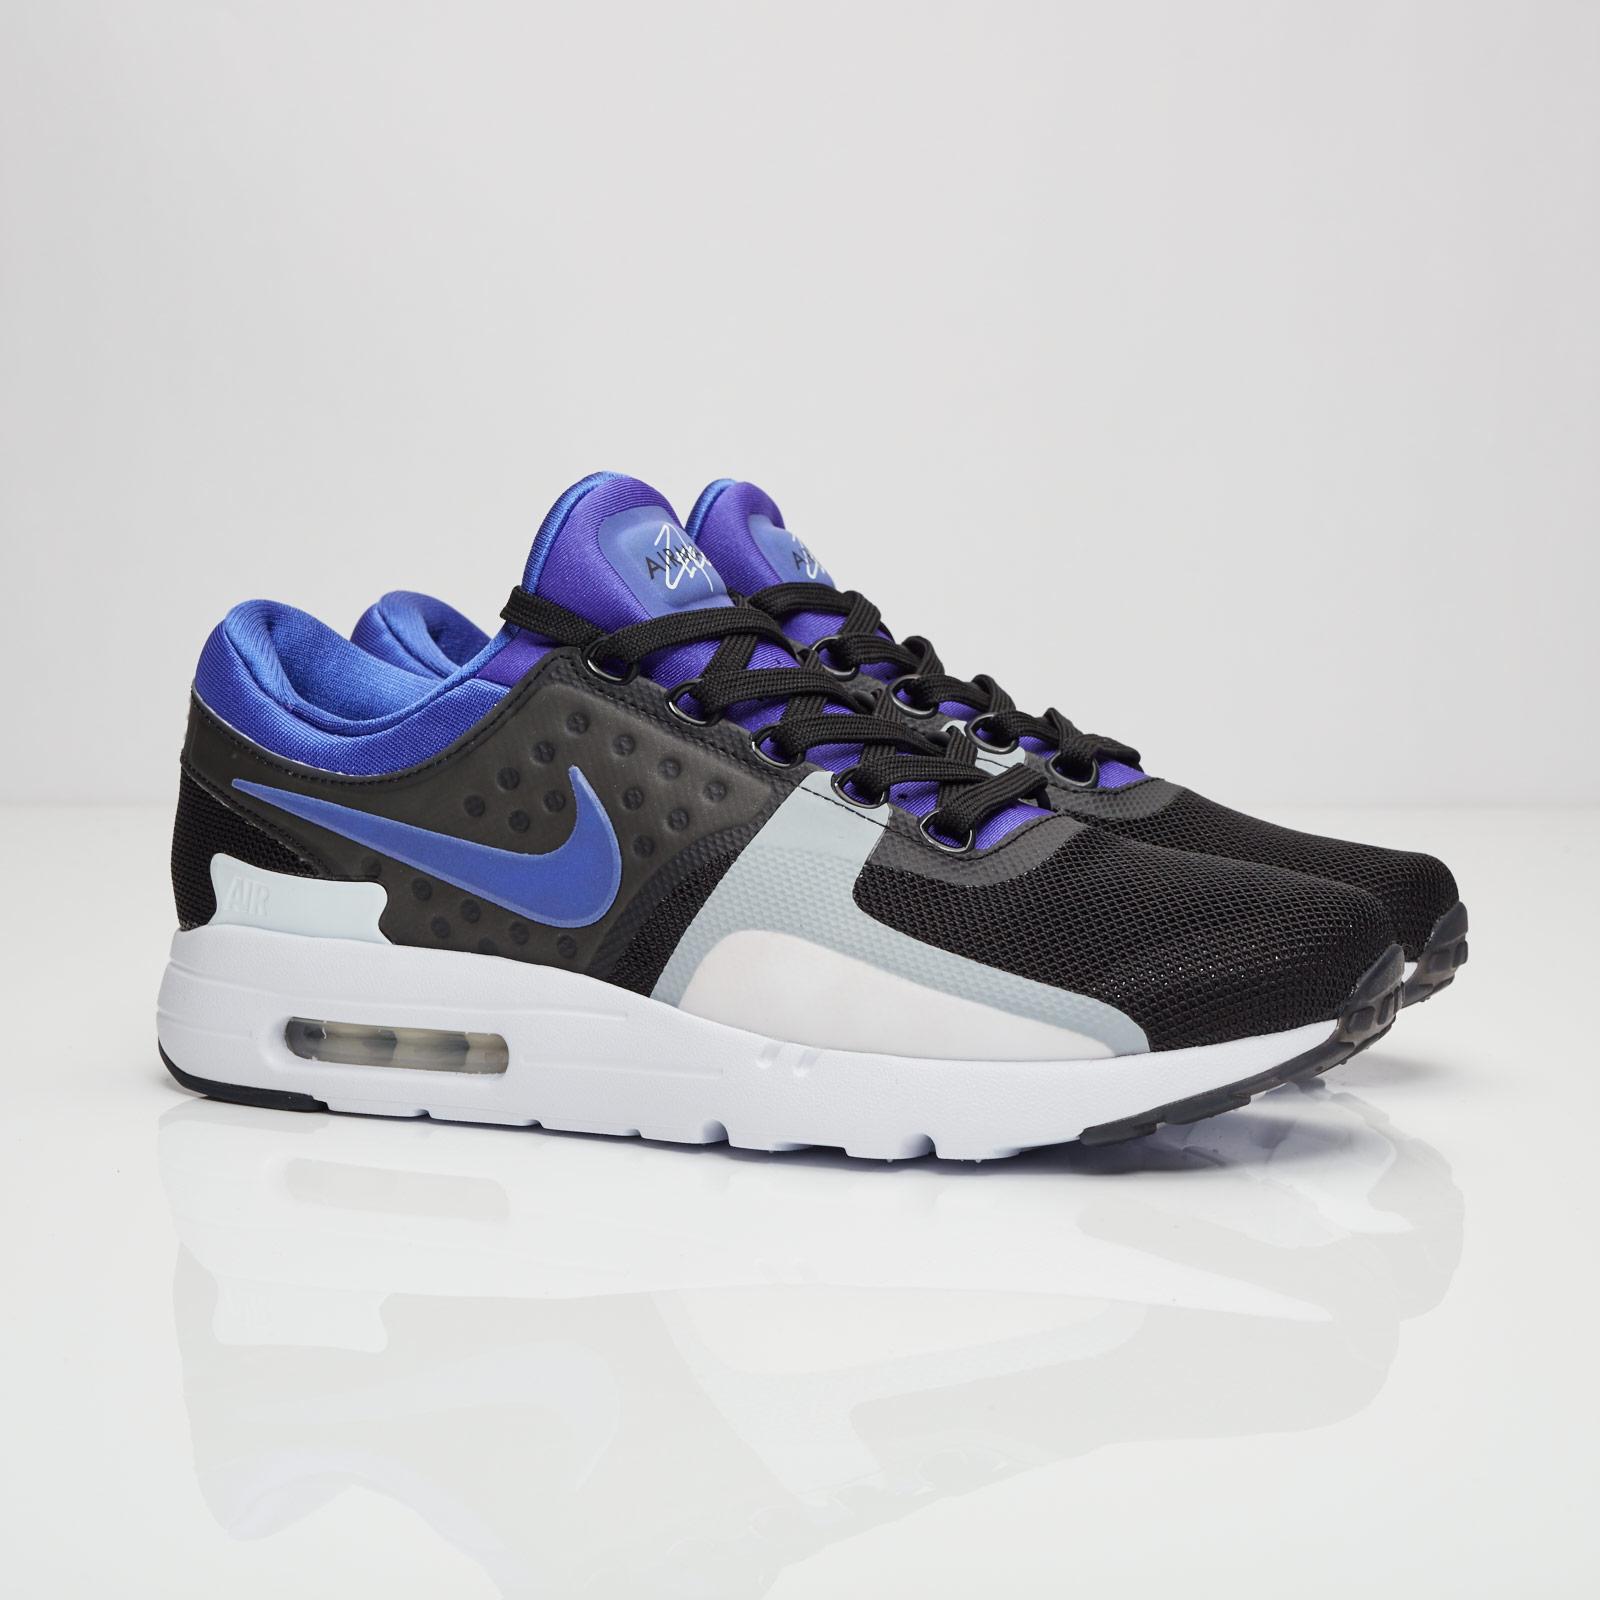 Nike Air Max Zero QS 789695 004 Sneakersnstuff